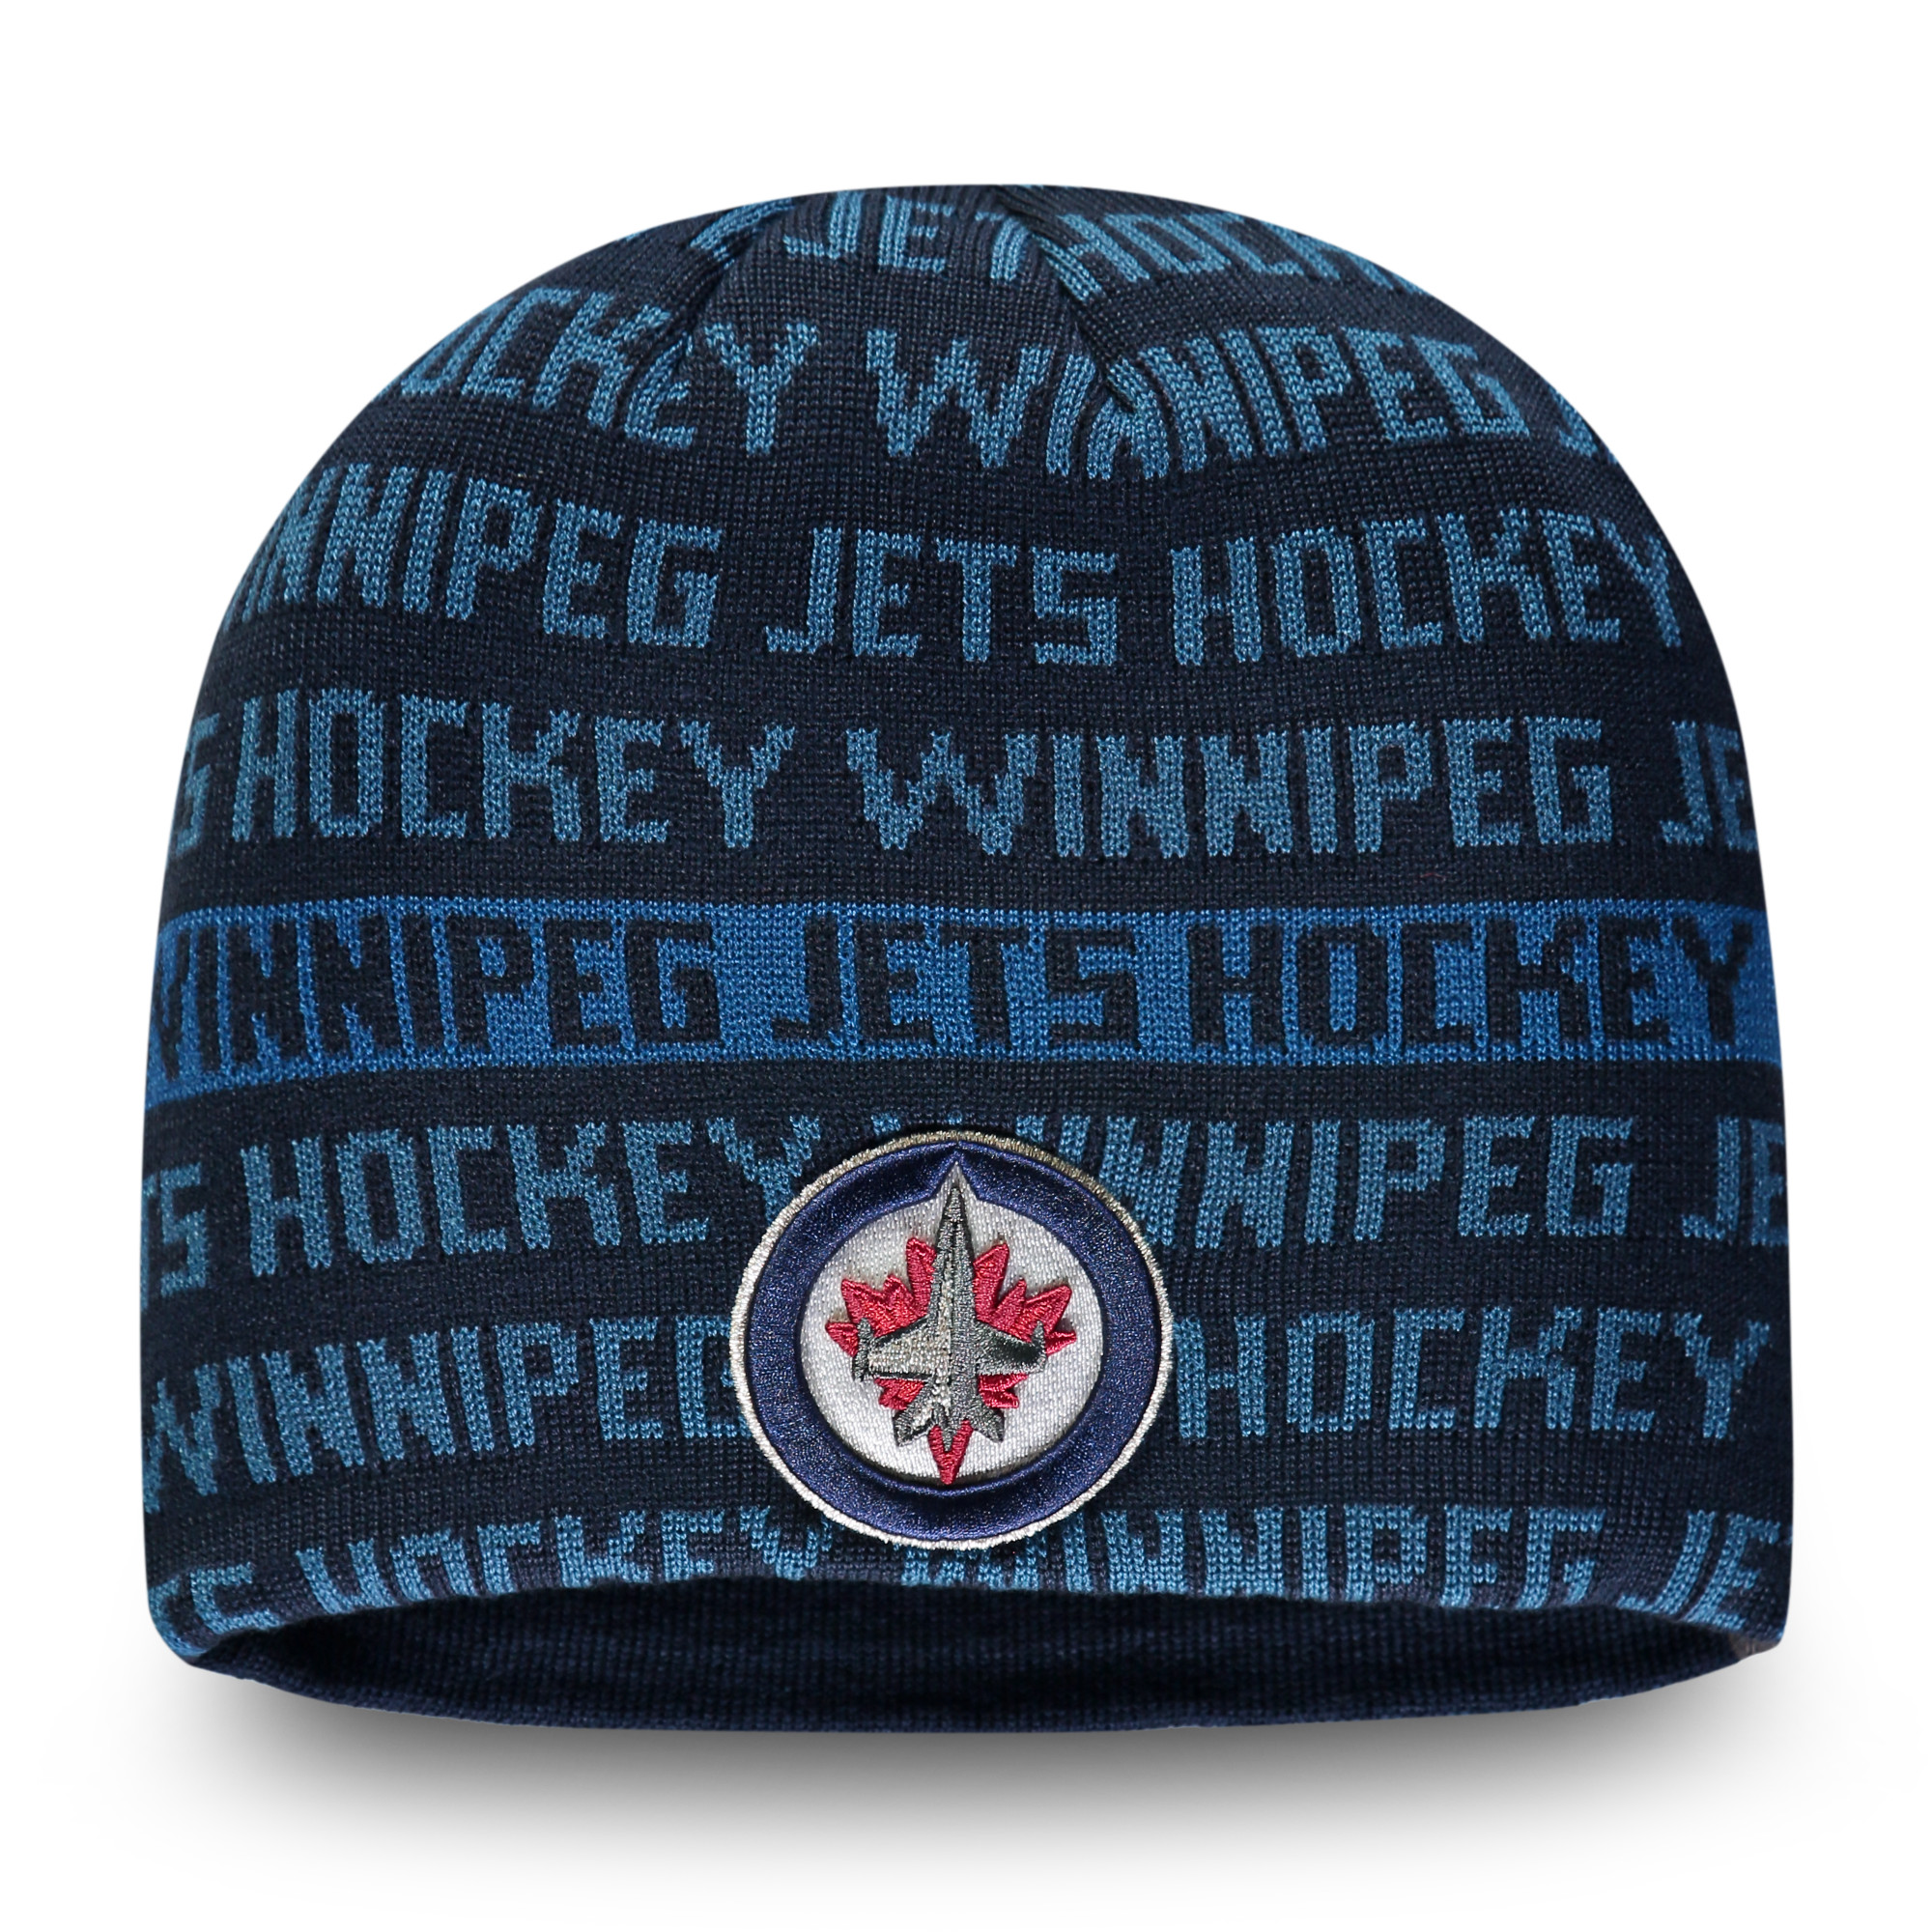 Winnipeg Jets Fanatics Branded Authentic Pro Rinkside Knit Beanie - Navy/Blue - OSFA